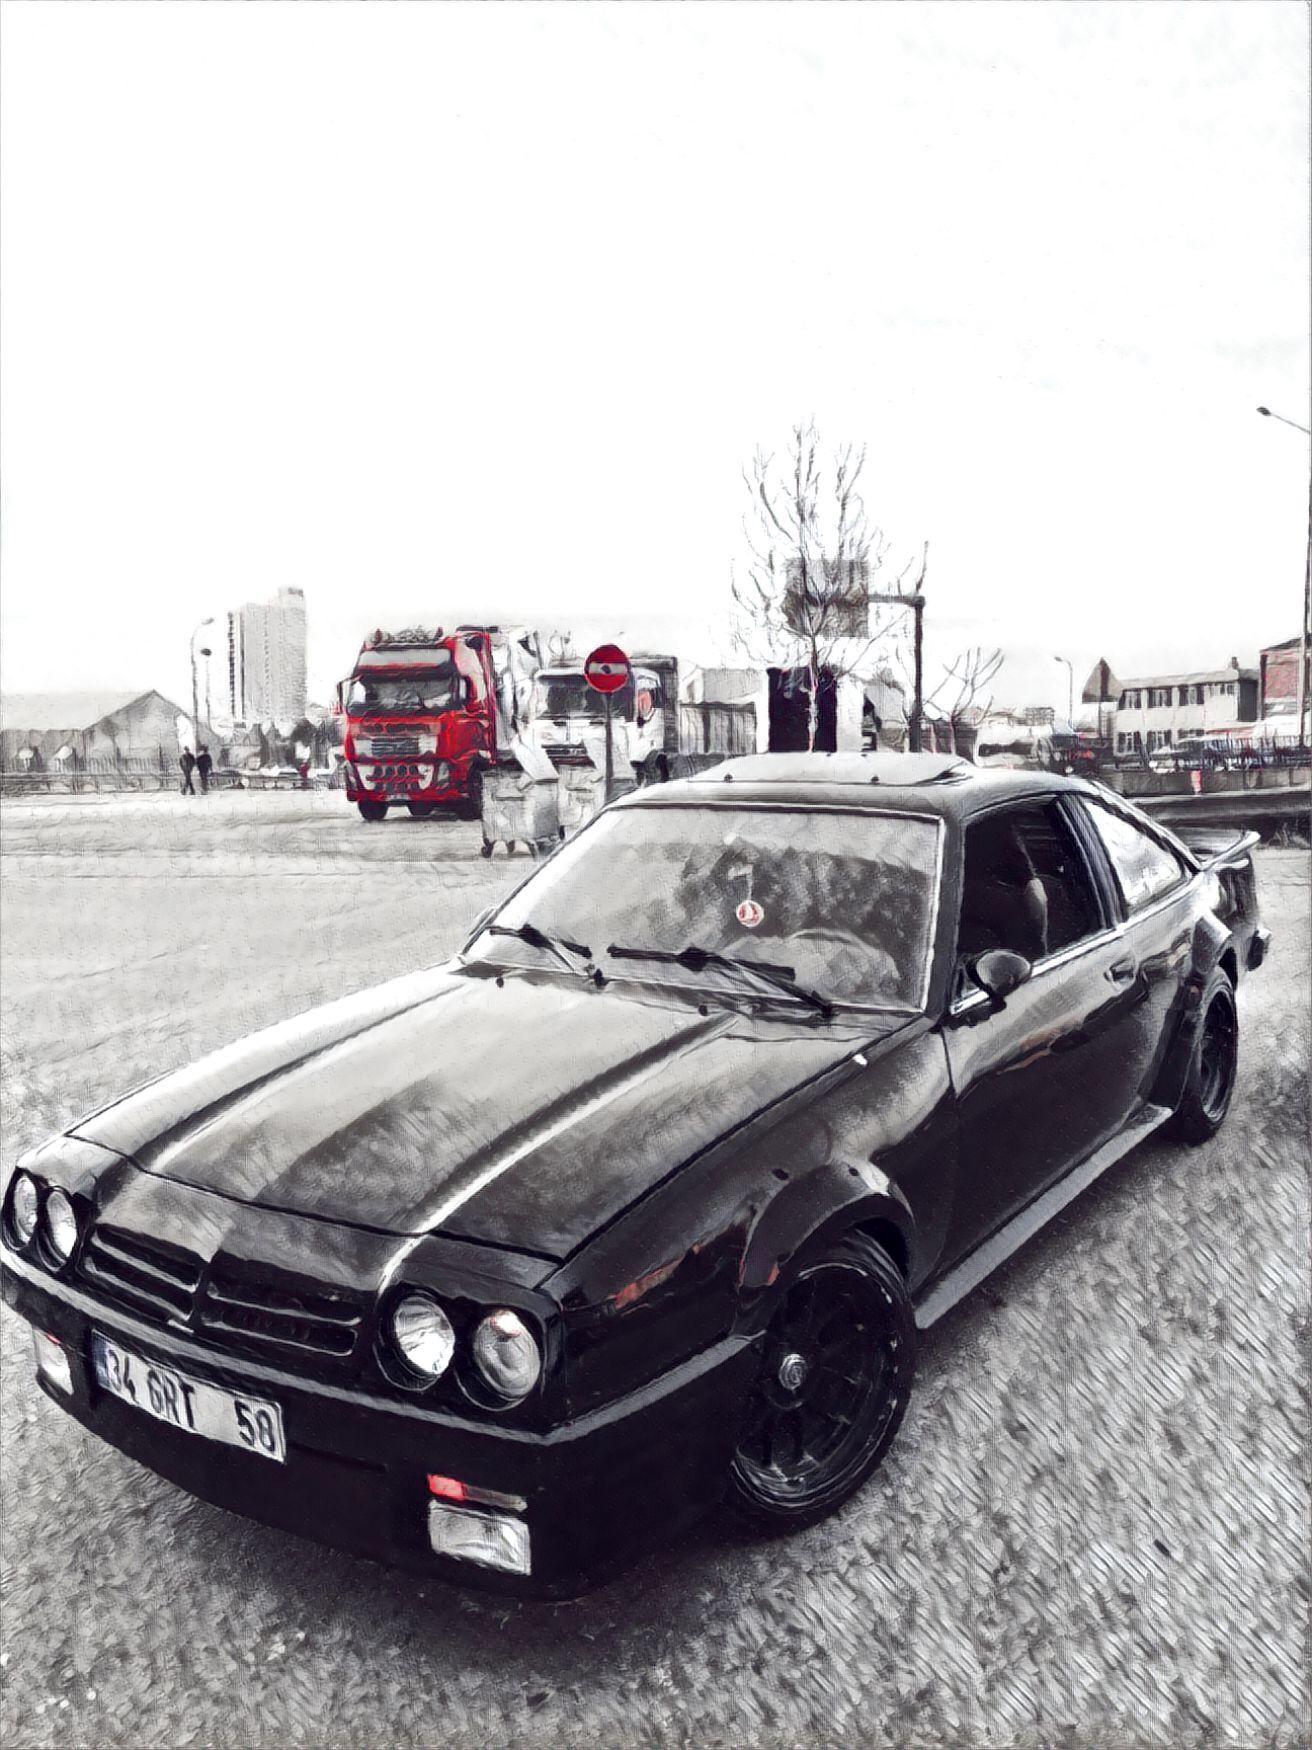 Pin by Can Çınar on Opel Manta Opel, Cars, Bmw